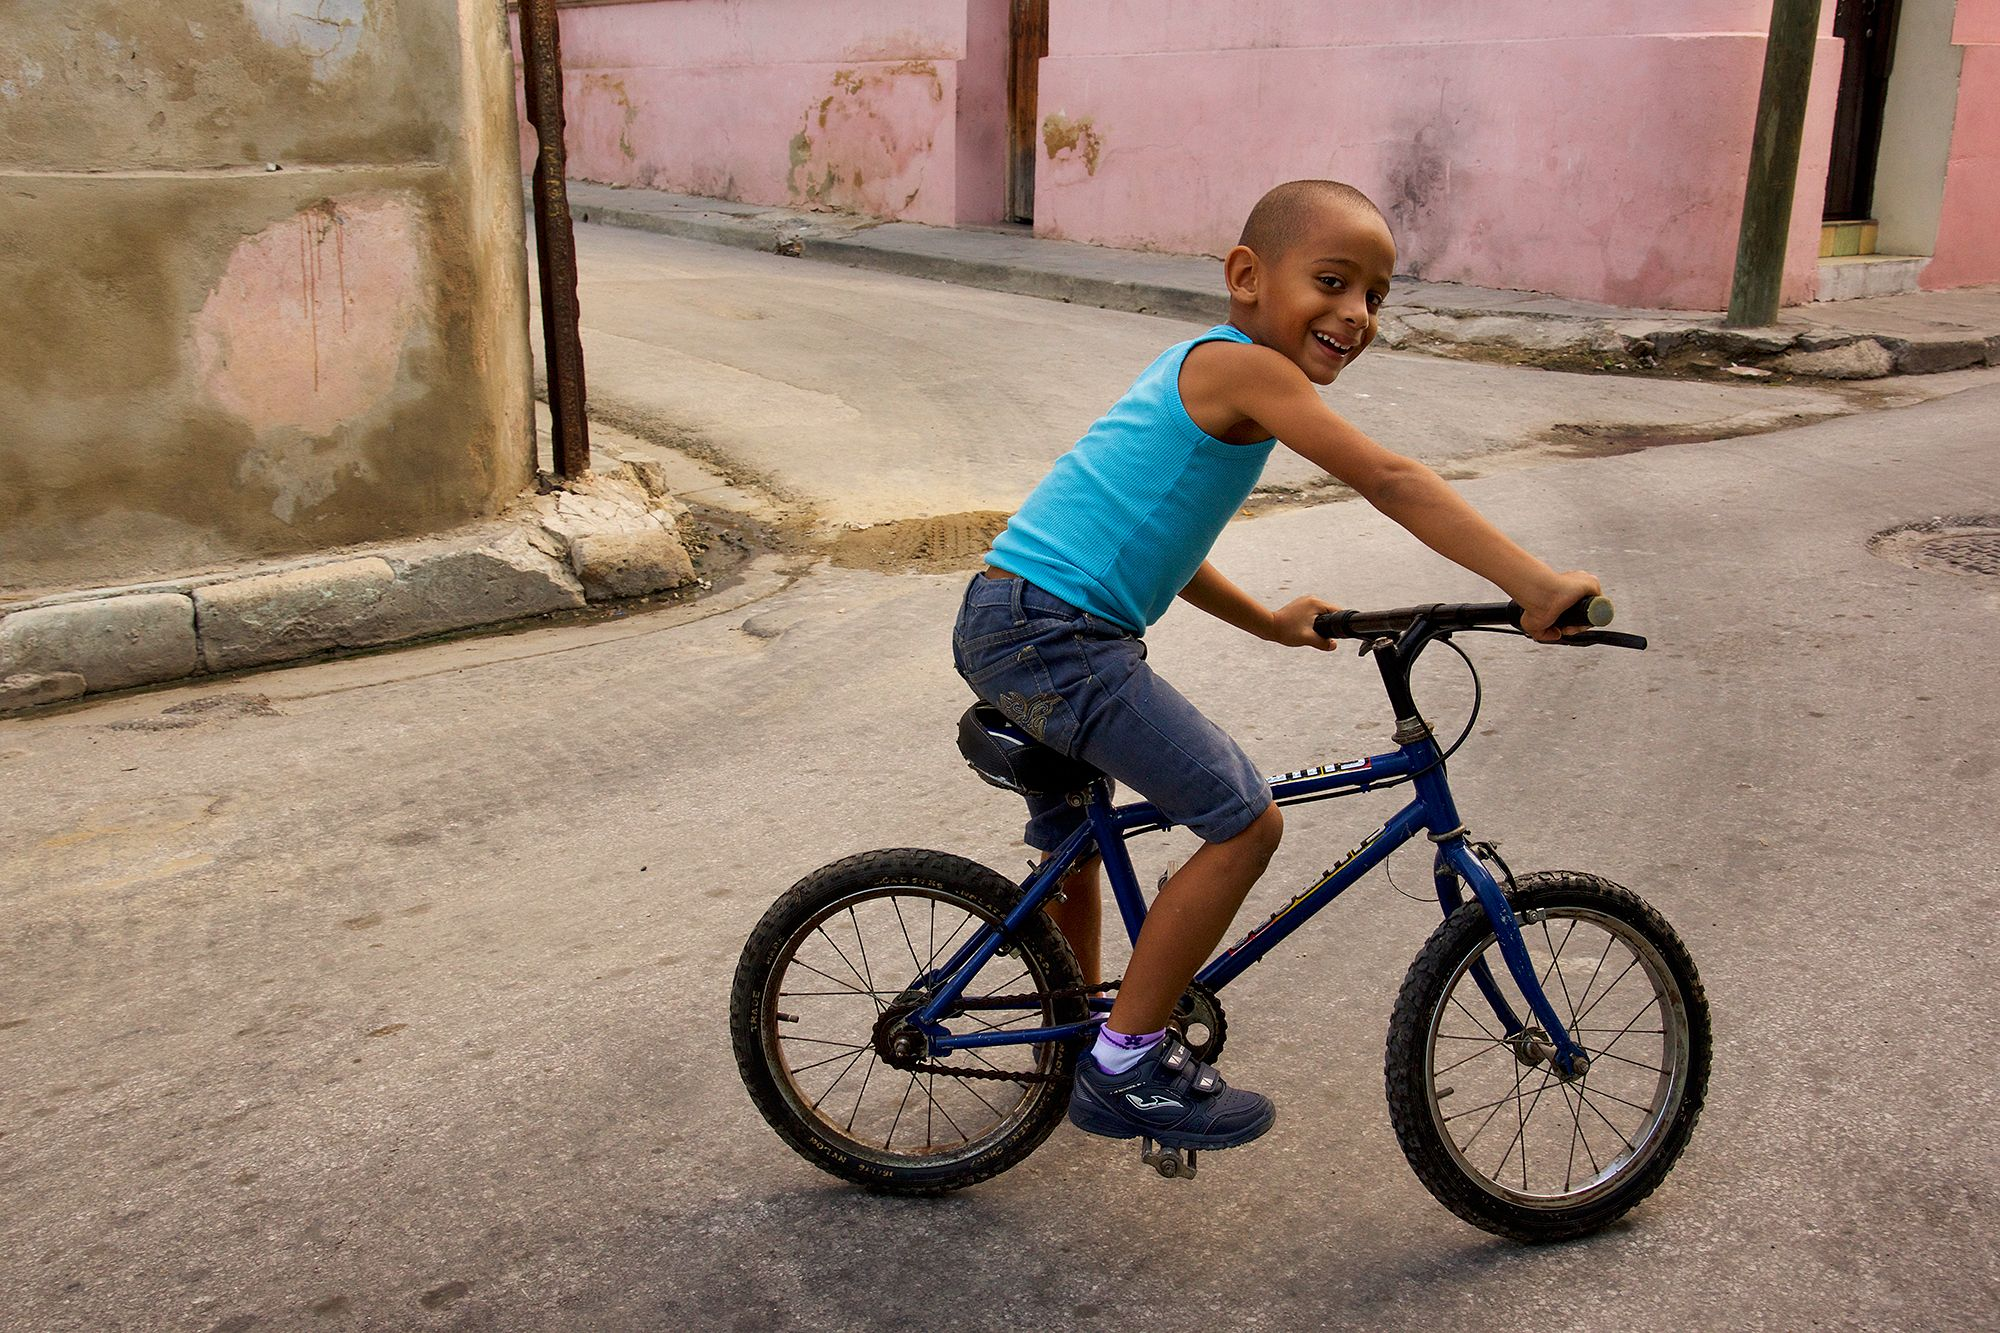 Young Cuban boy